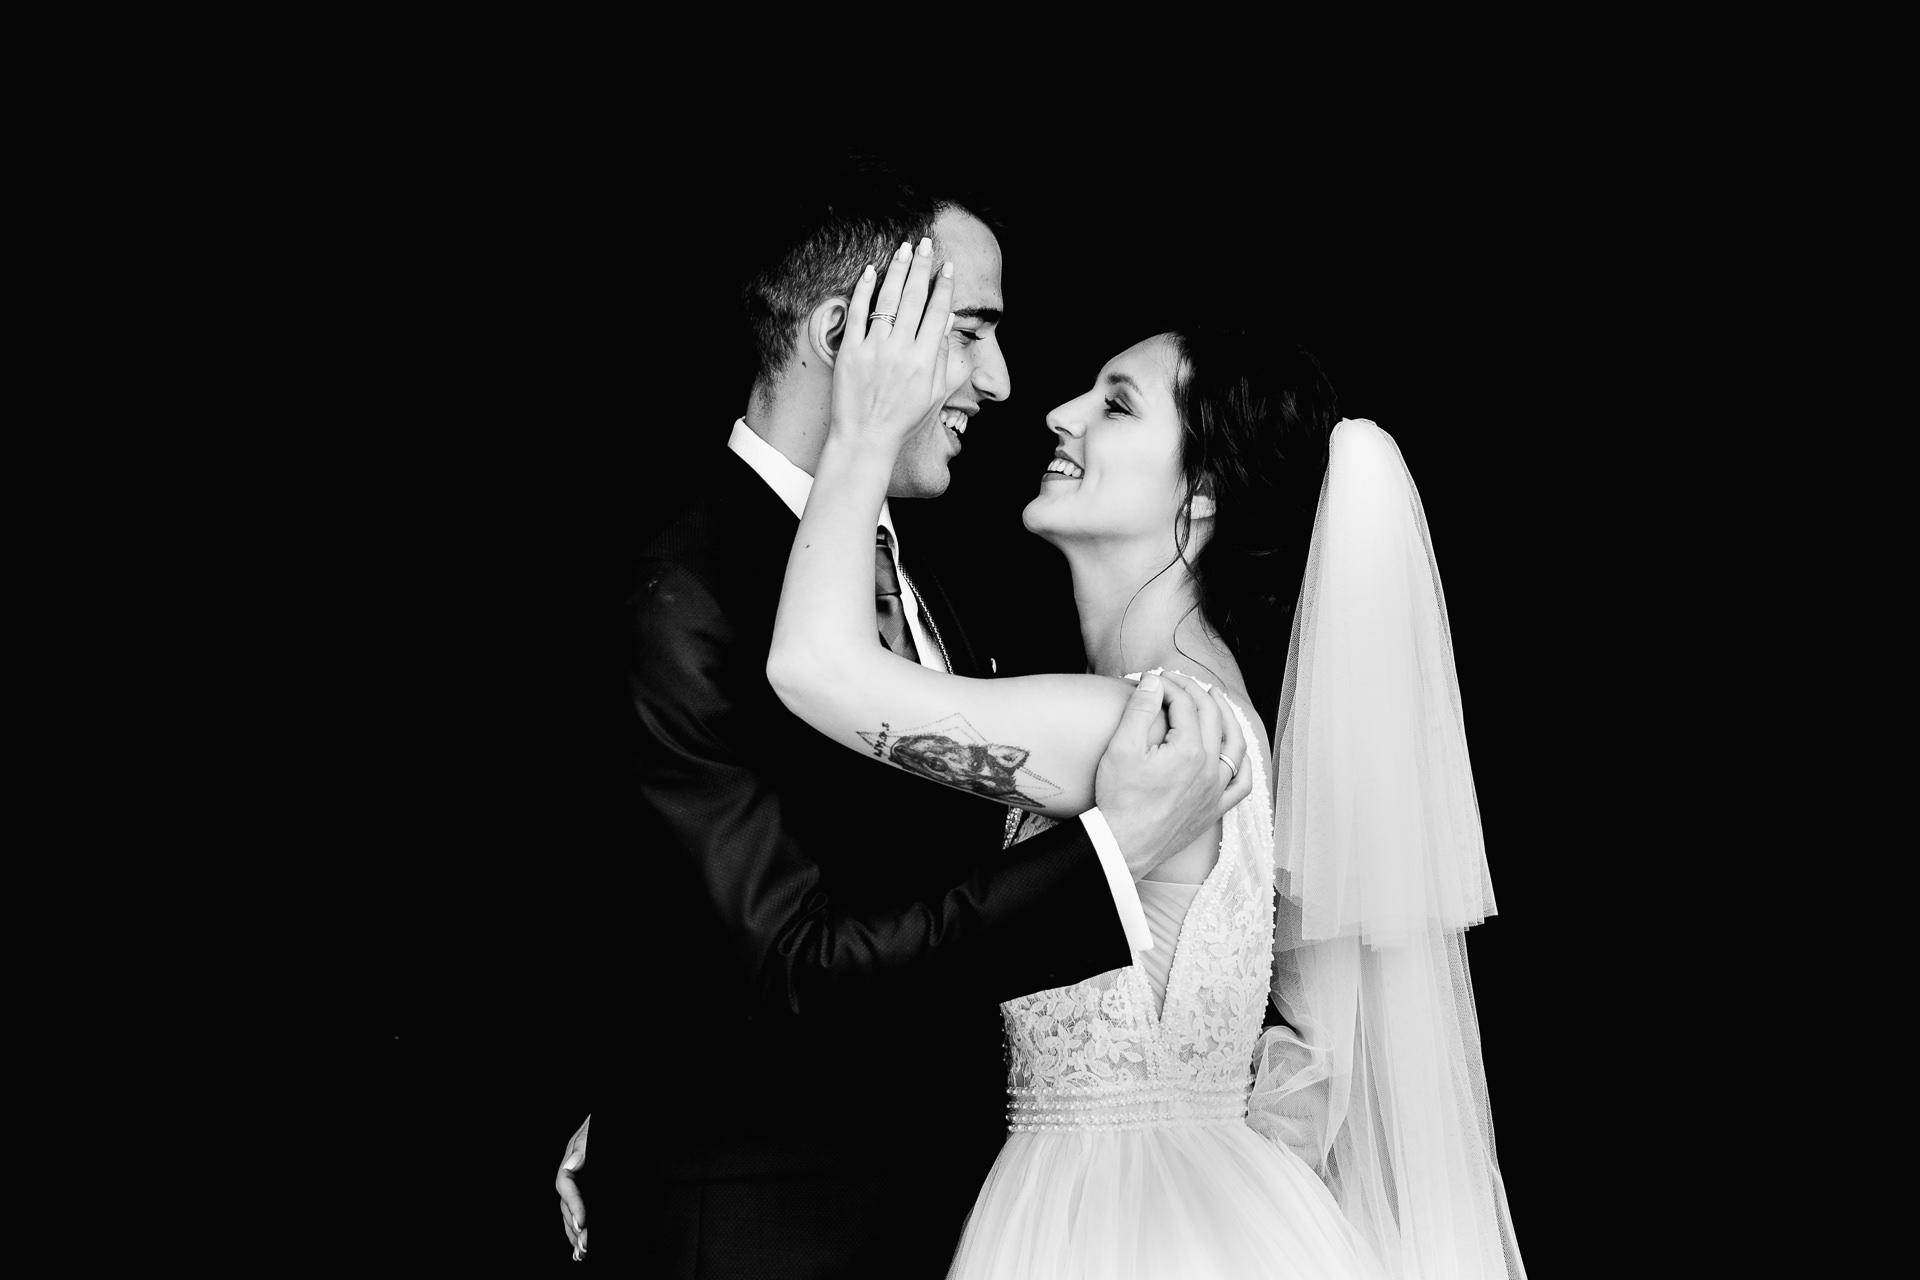 boda civil eguren ugarte larioja 150808